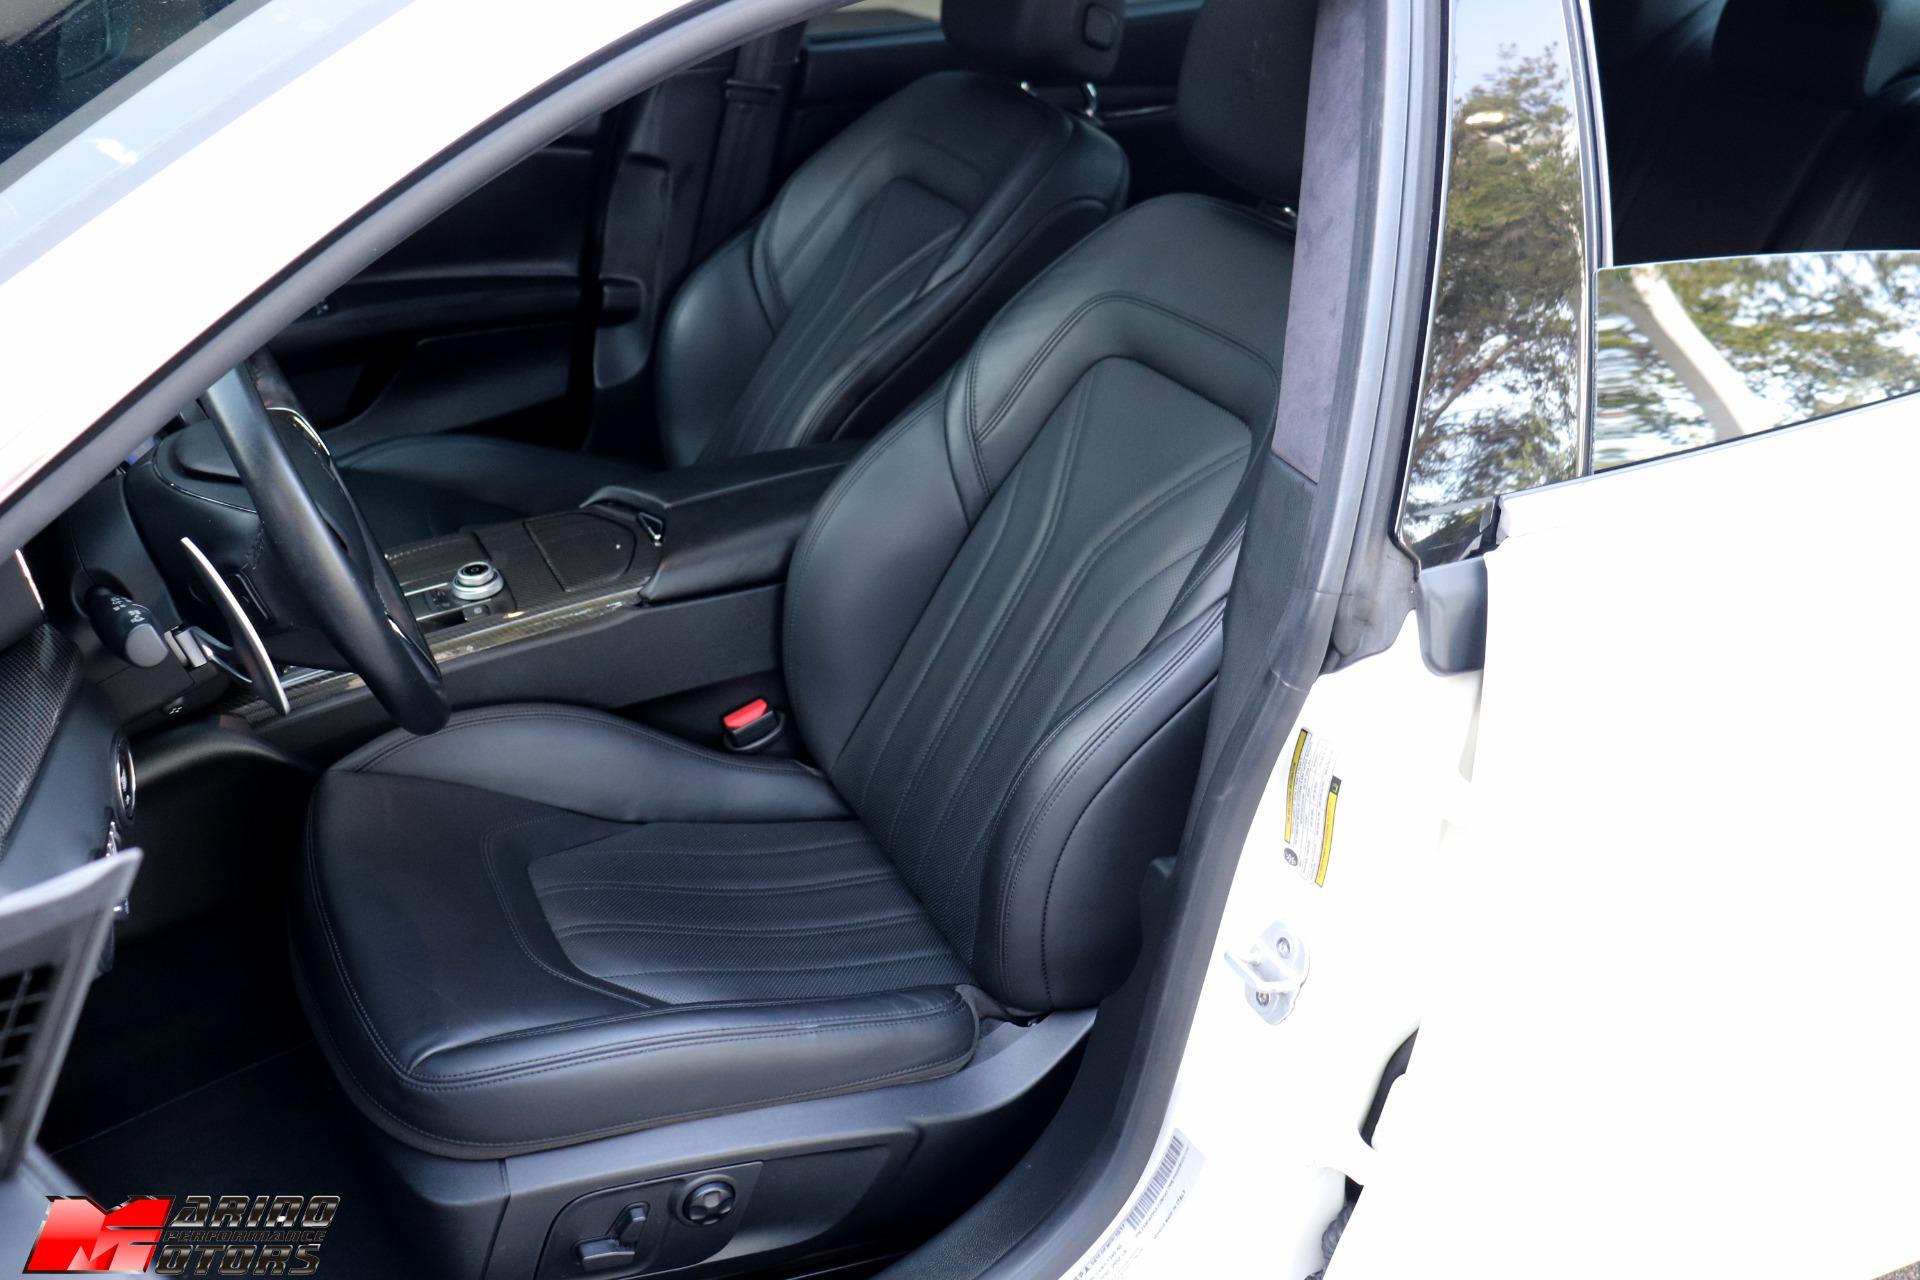 Used-2018-Maserati-Quattroporte-GTS-GranLusso